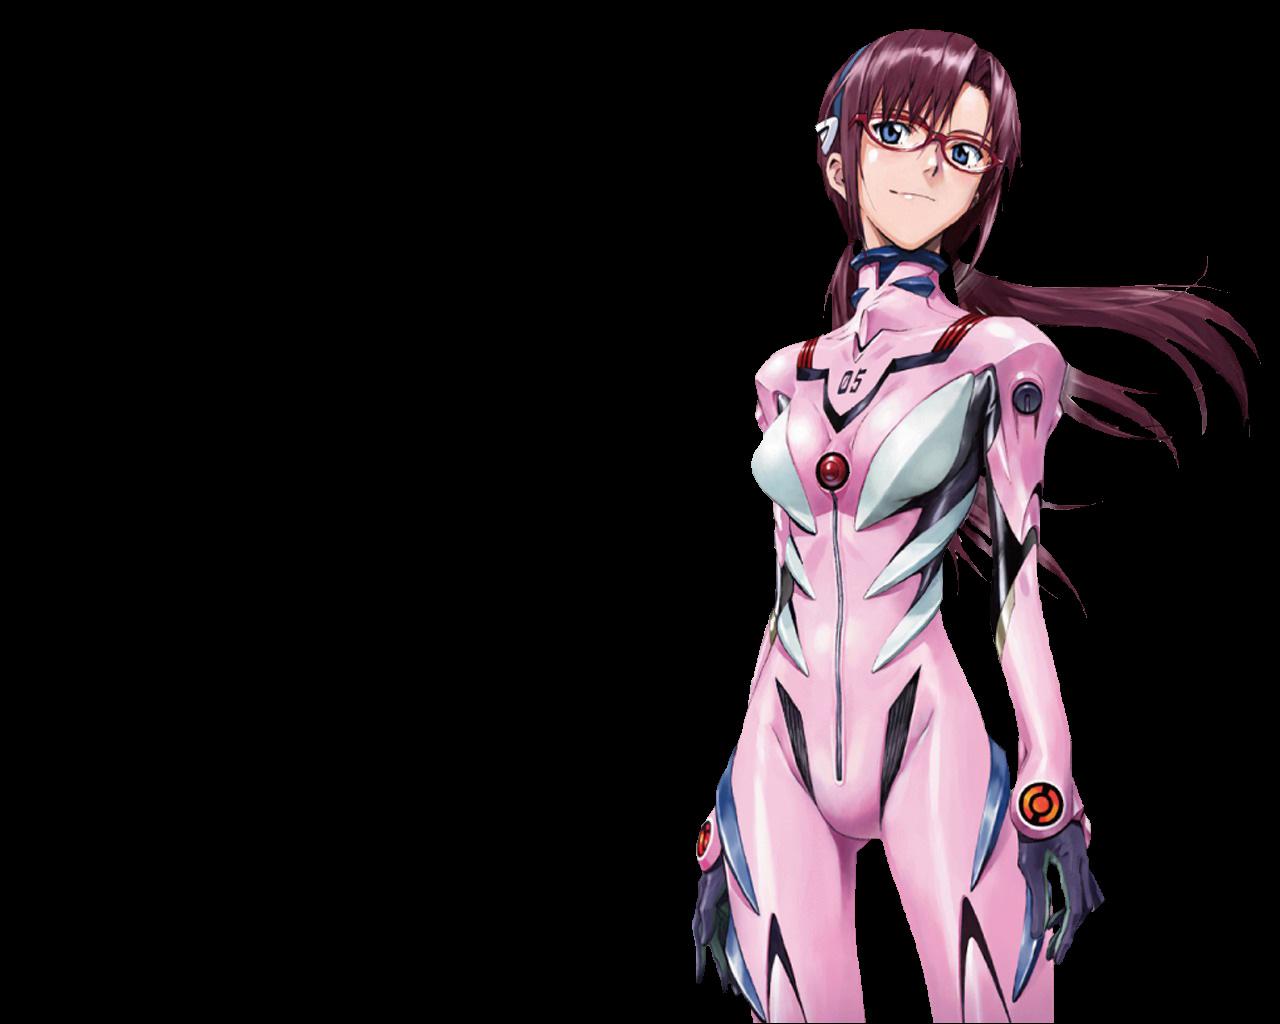 Neon Genesis Evangelion Res: 1280x1024 / Size:141kb. Views: 154188